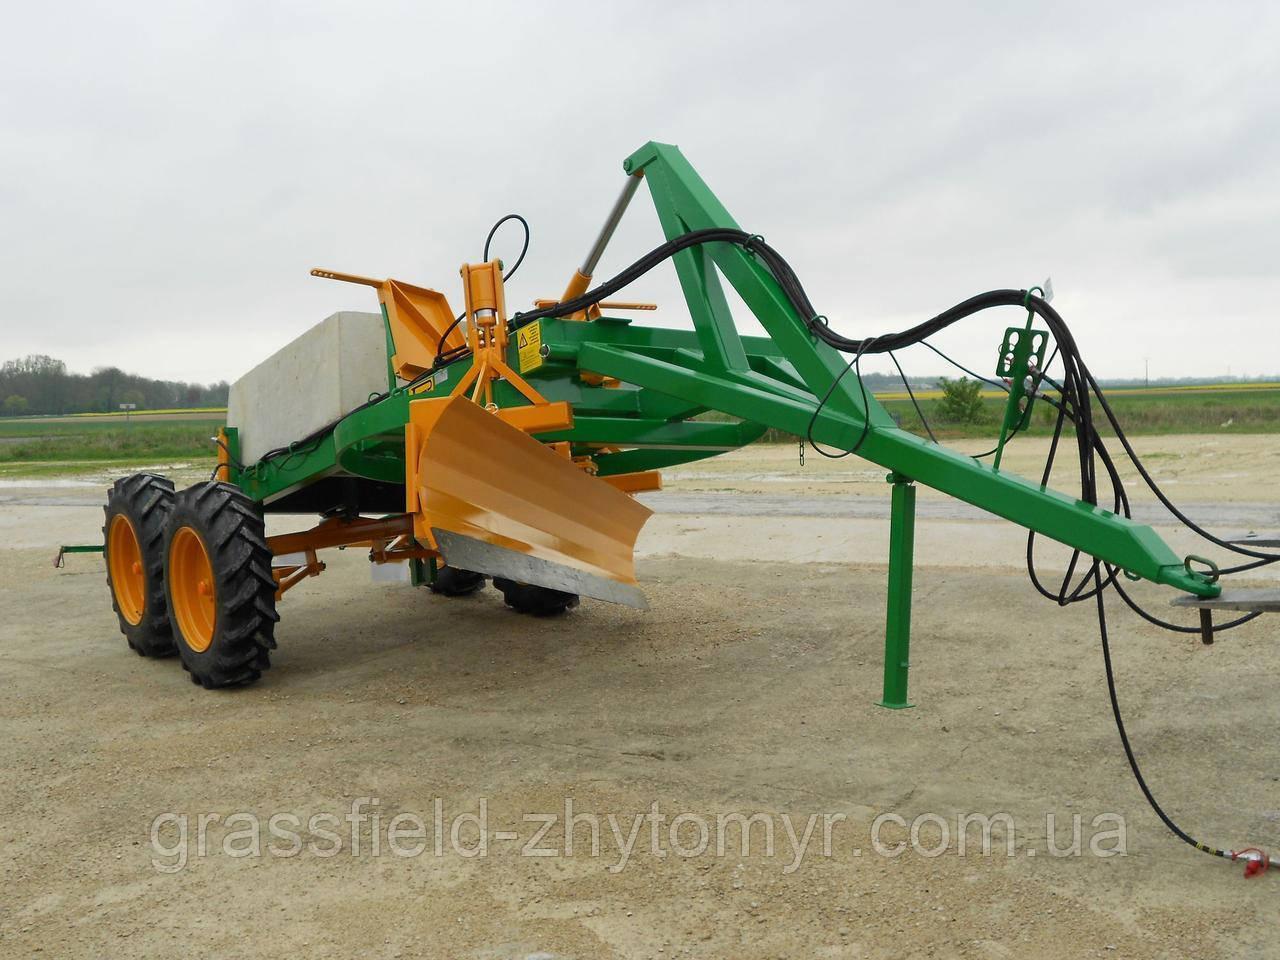 Грейдер Perrein TP 3600 3,6 метра 3800 кг. 4 колеса